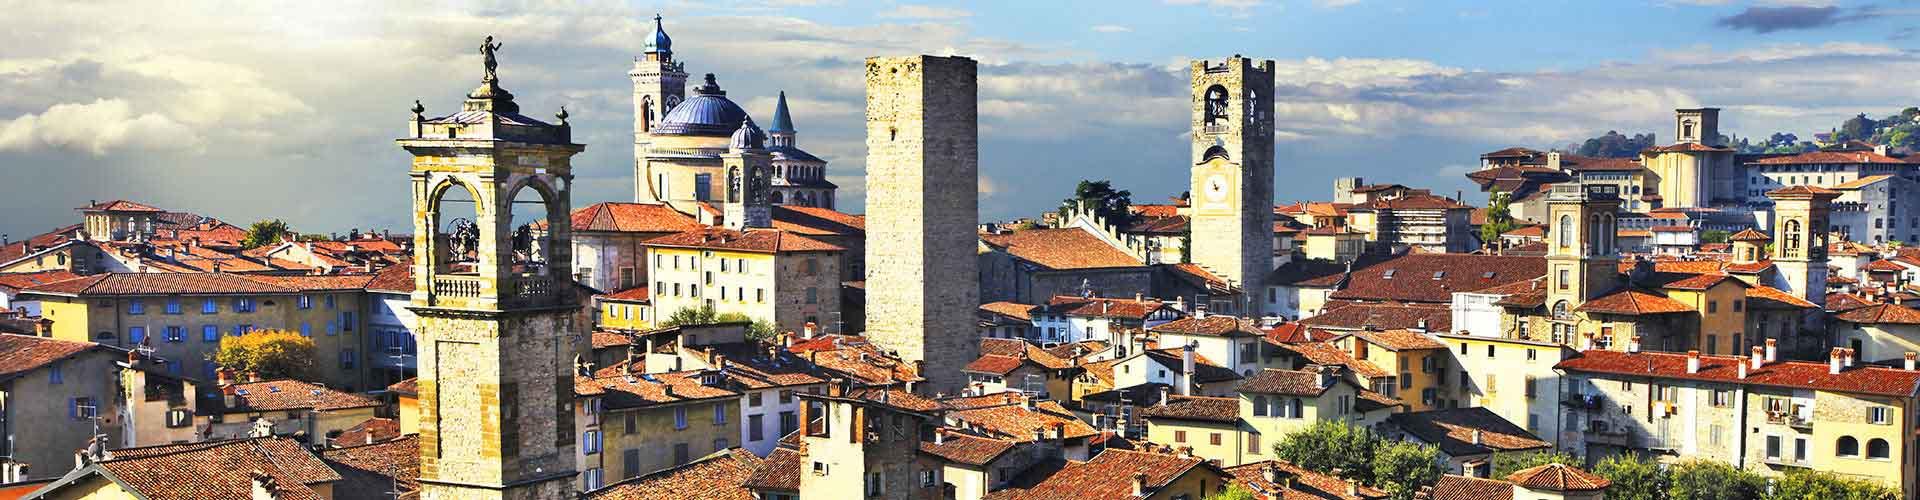 Bergamo - Camping à Bergamo. Cartes pour Bergamo, photos et commentaires pour chaque Camping à Bergamo.